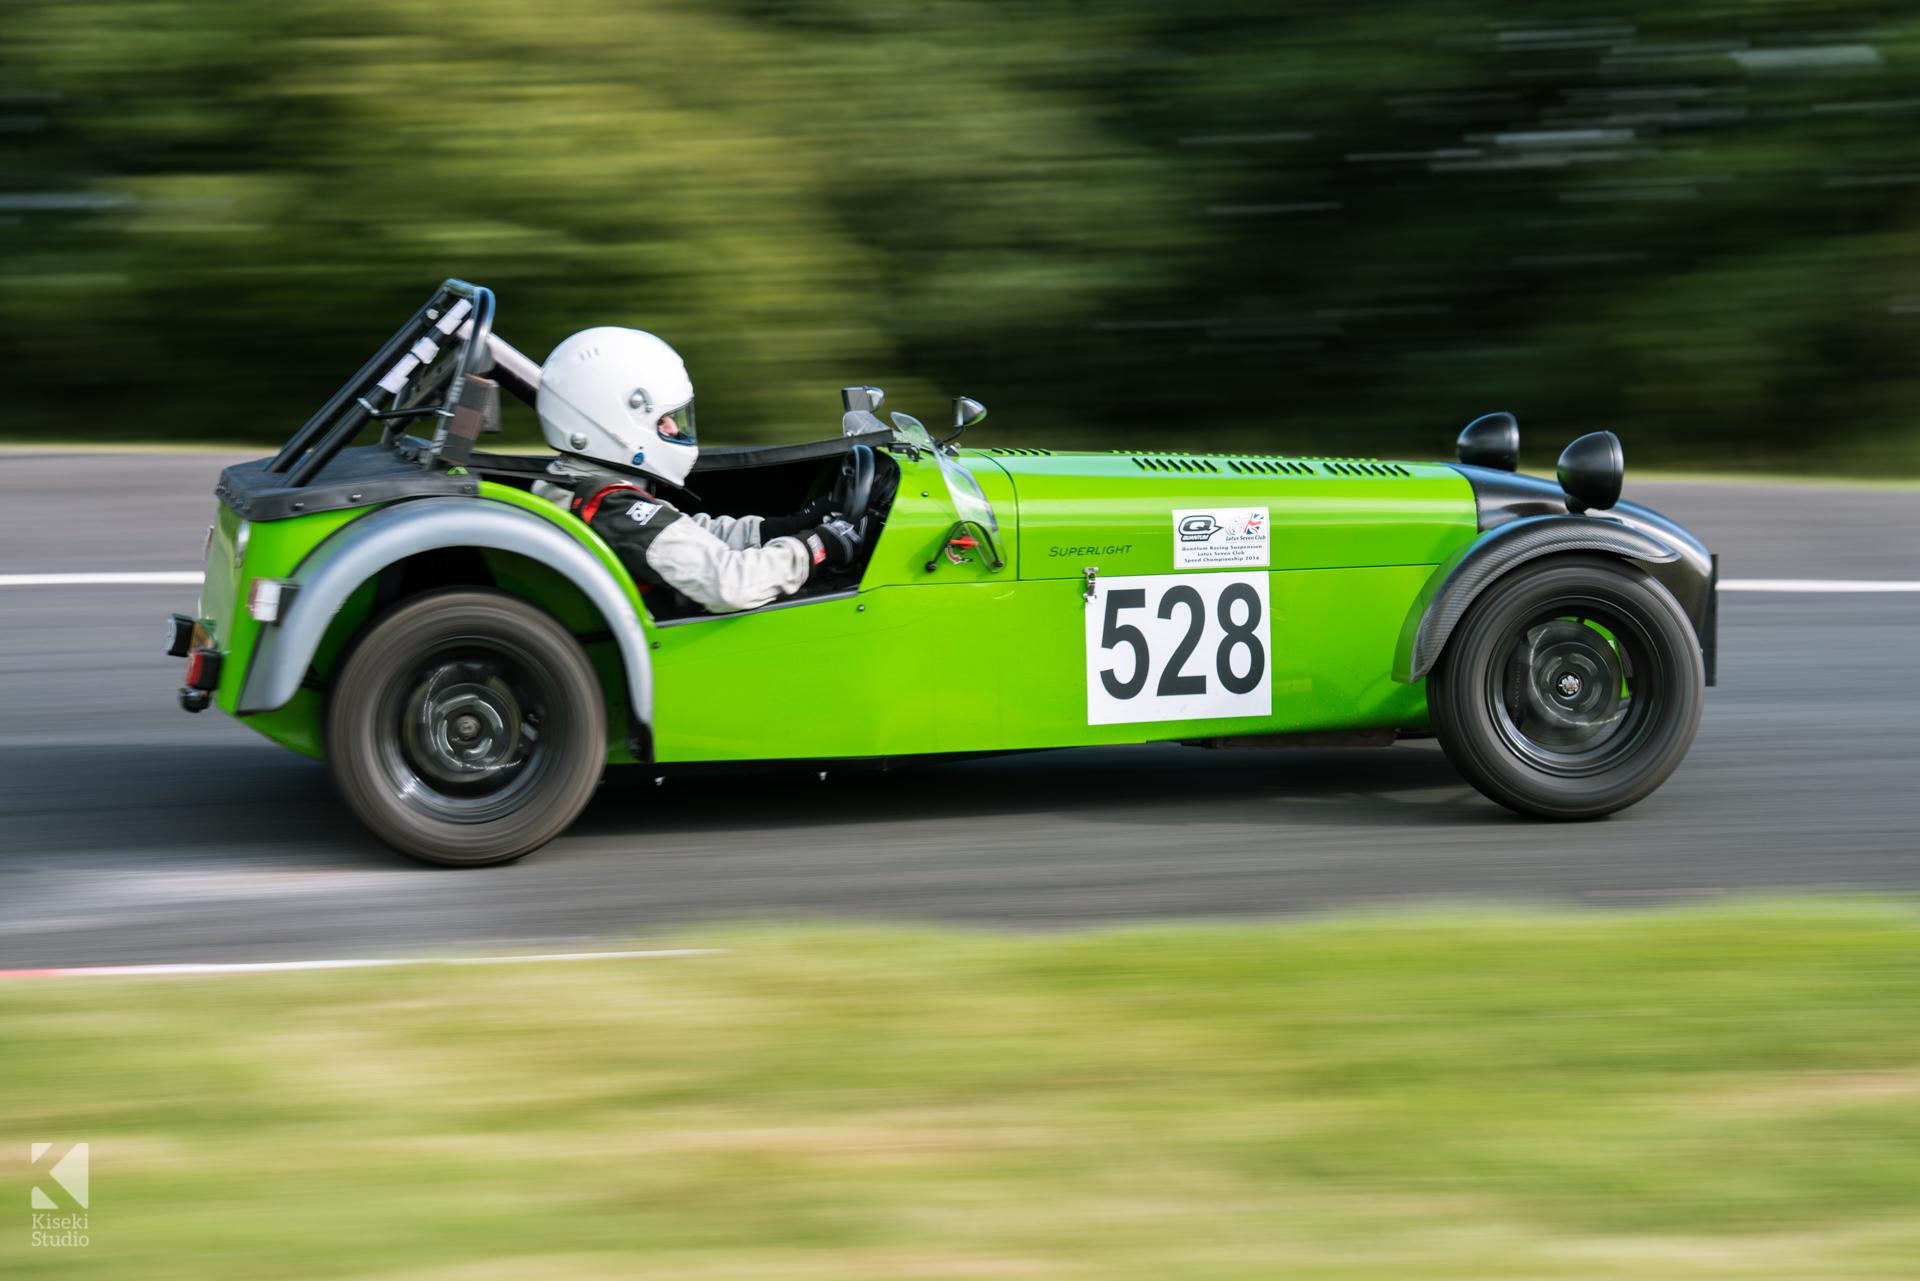 Caterham 7 Lotus in green at Harewood Hillclimb